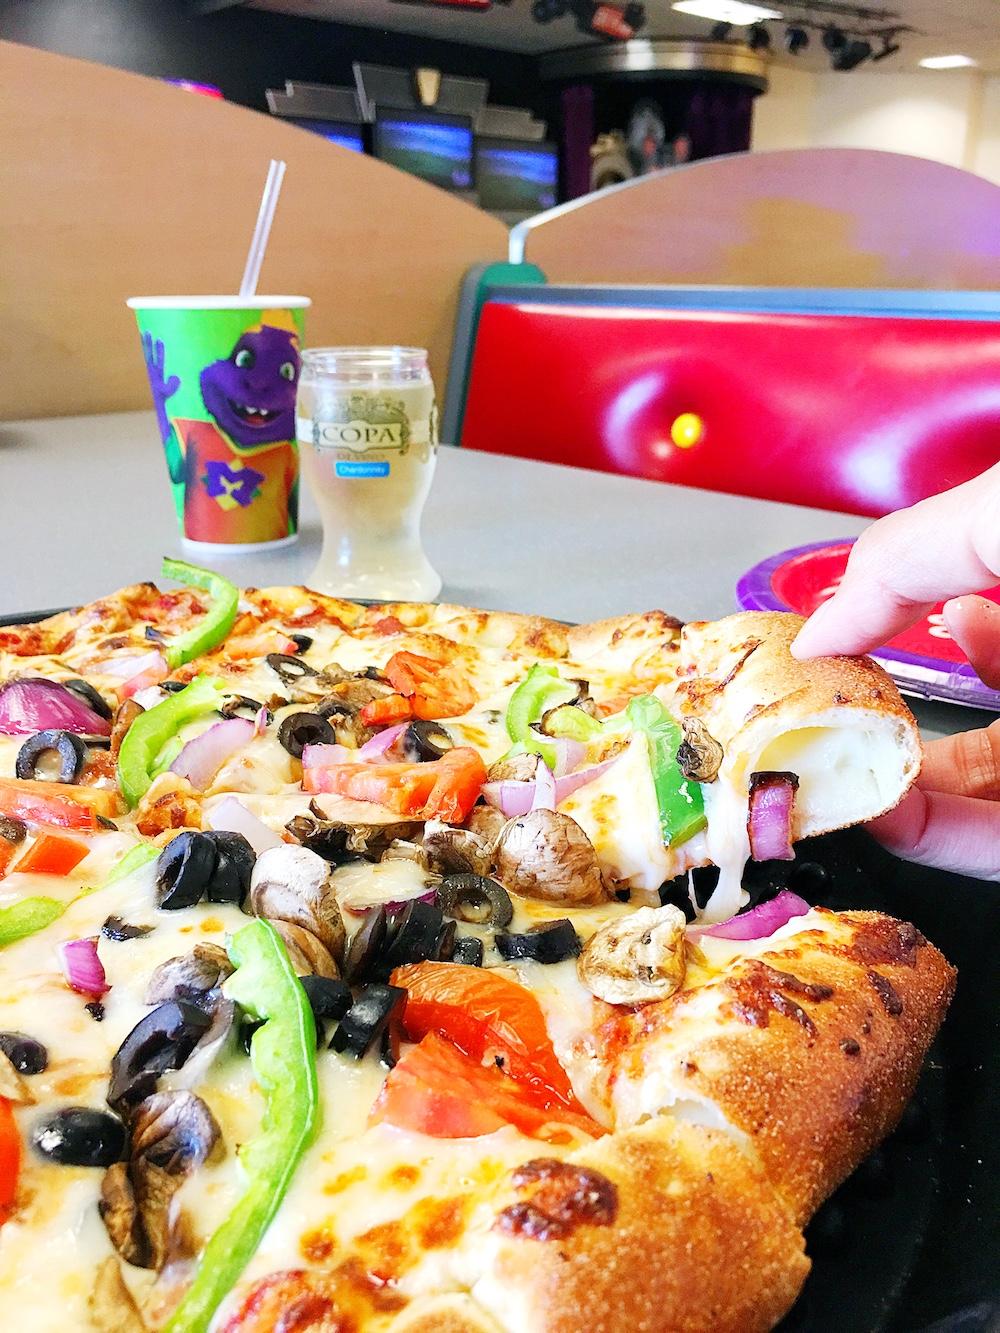 Best food to eat at Chuck E. Cheese's - LivingMiVidaLoca.com